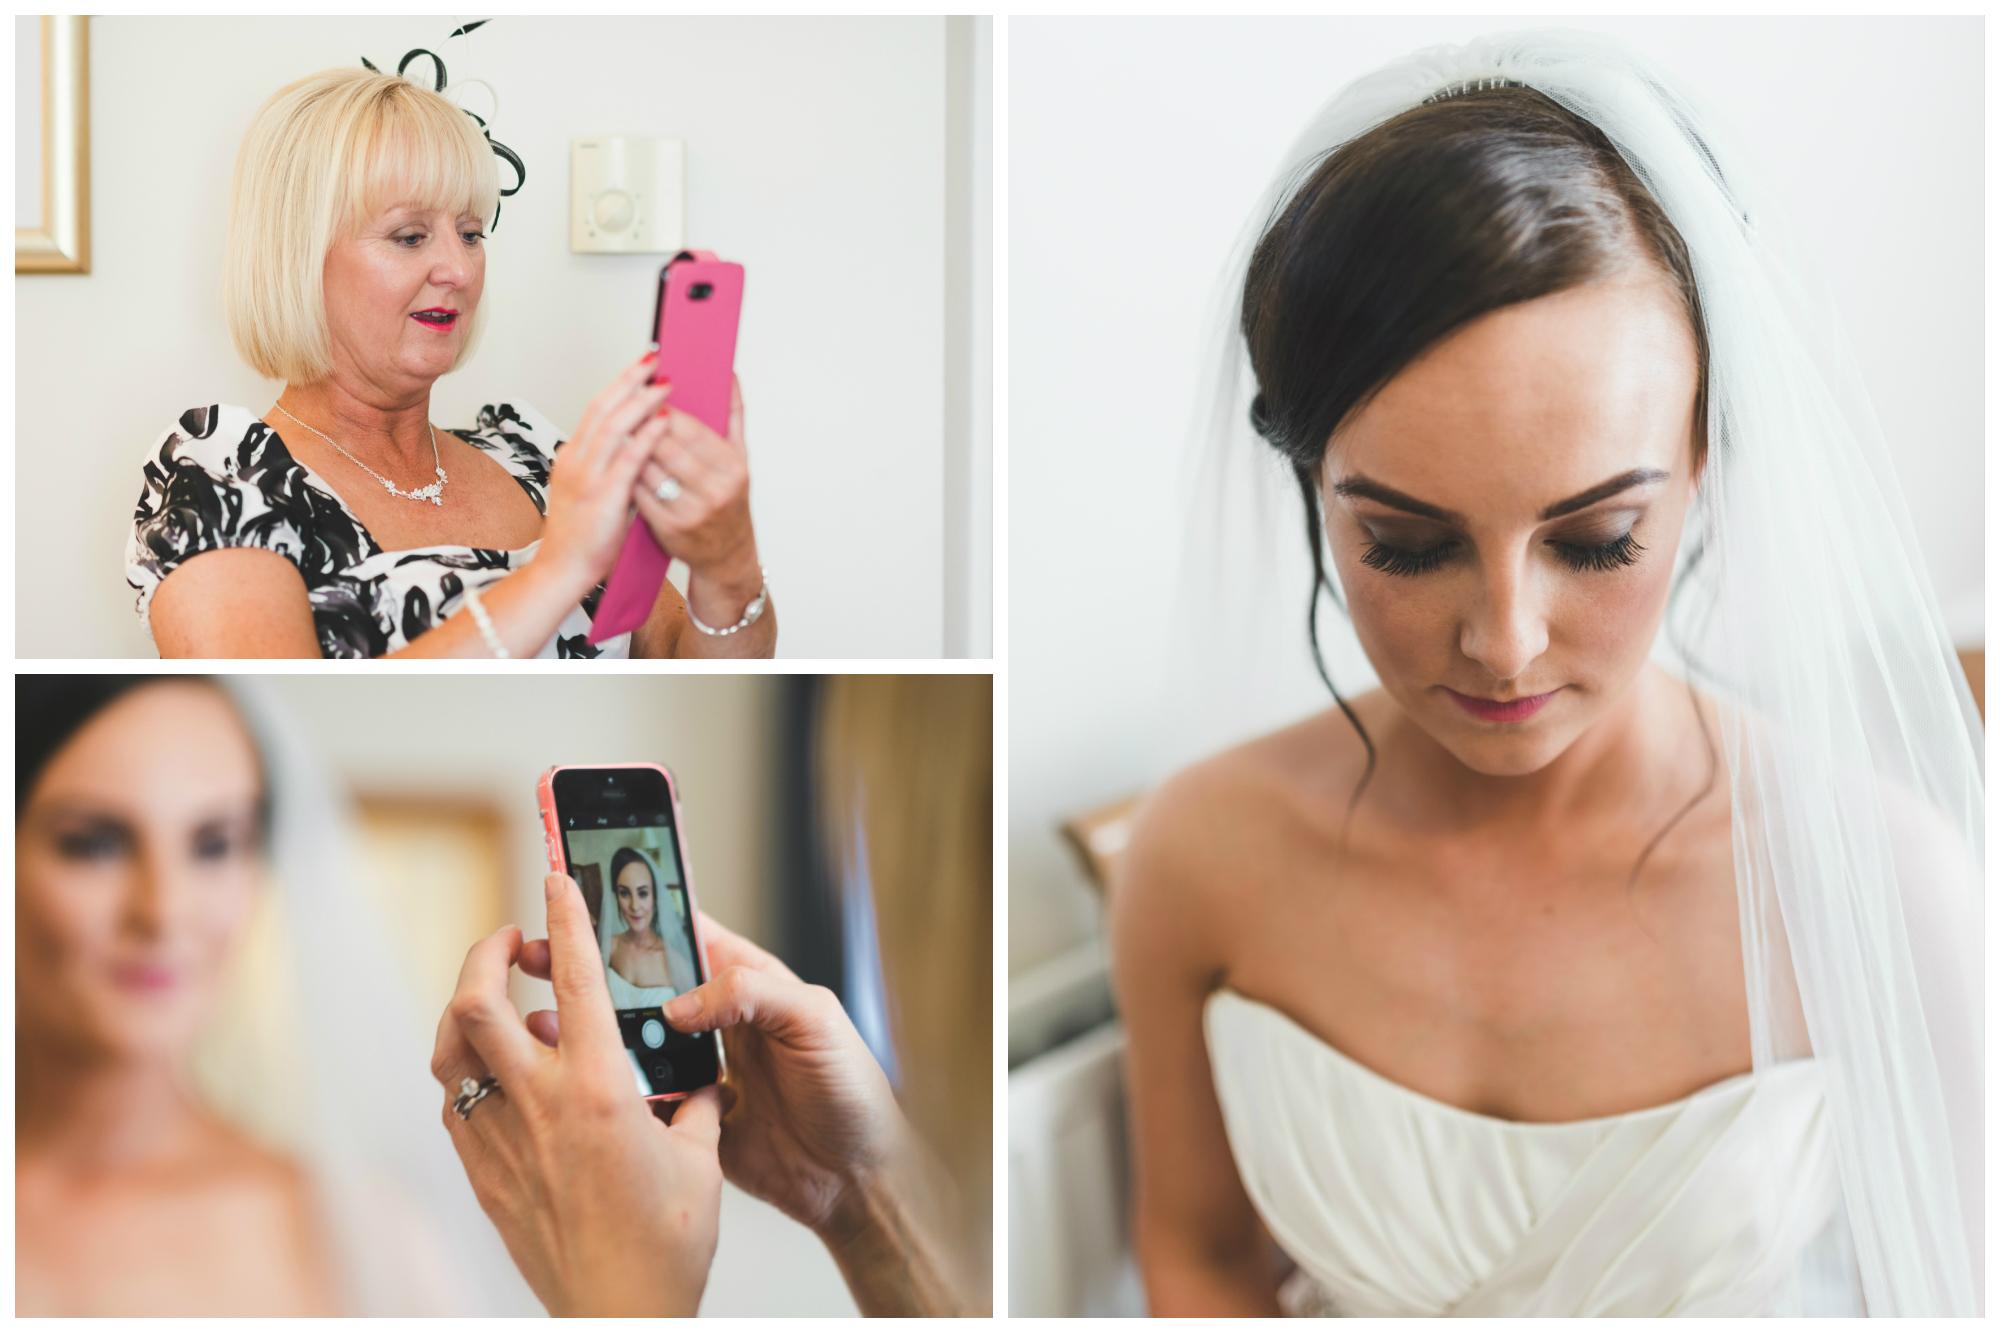 Northern_Ireland_Wedding_Photographer_Purephotoni_Dunsilly_Hotel_Bride_mobile.jpg